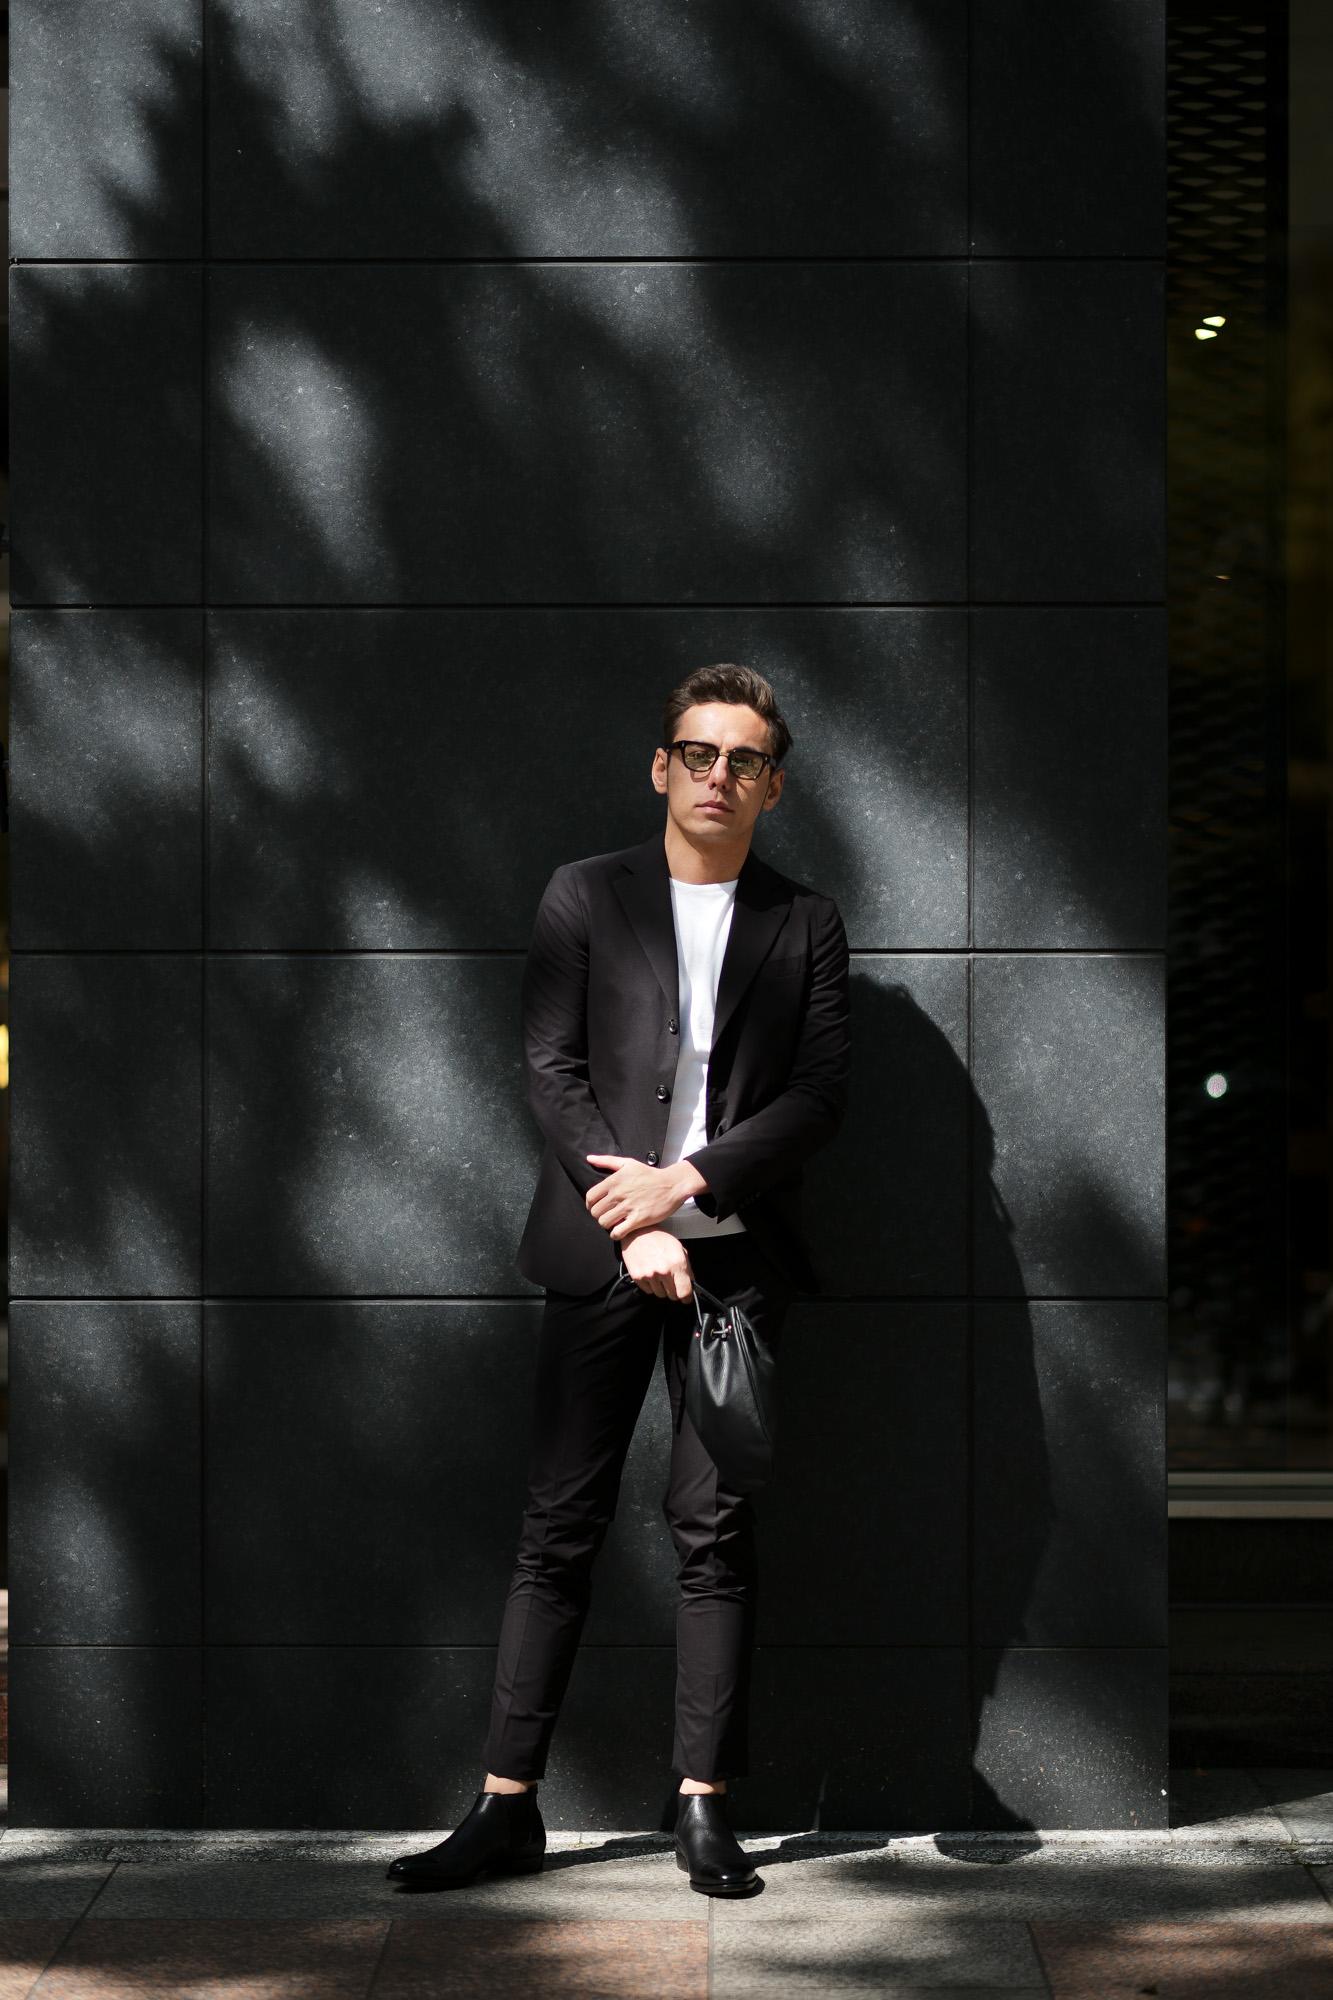 Cisei (シセイ) Drawstring Bag (ドローストリングバッグ) Lindos Leather (リンドス レザー) レザードローストリングバック 巾着 NERO (ブラック) Made in italy (イタリア製) 2019 春夏新作 愛知 名古屋 alto e diritto アルトエデリット